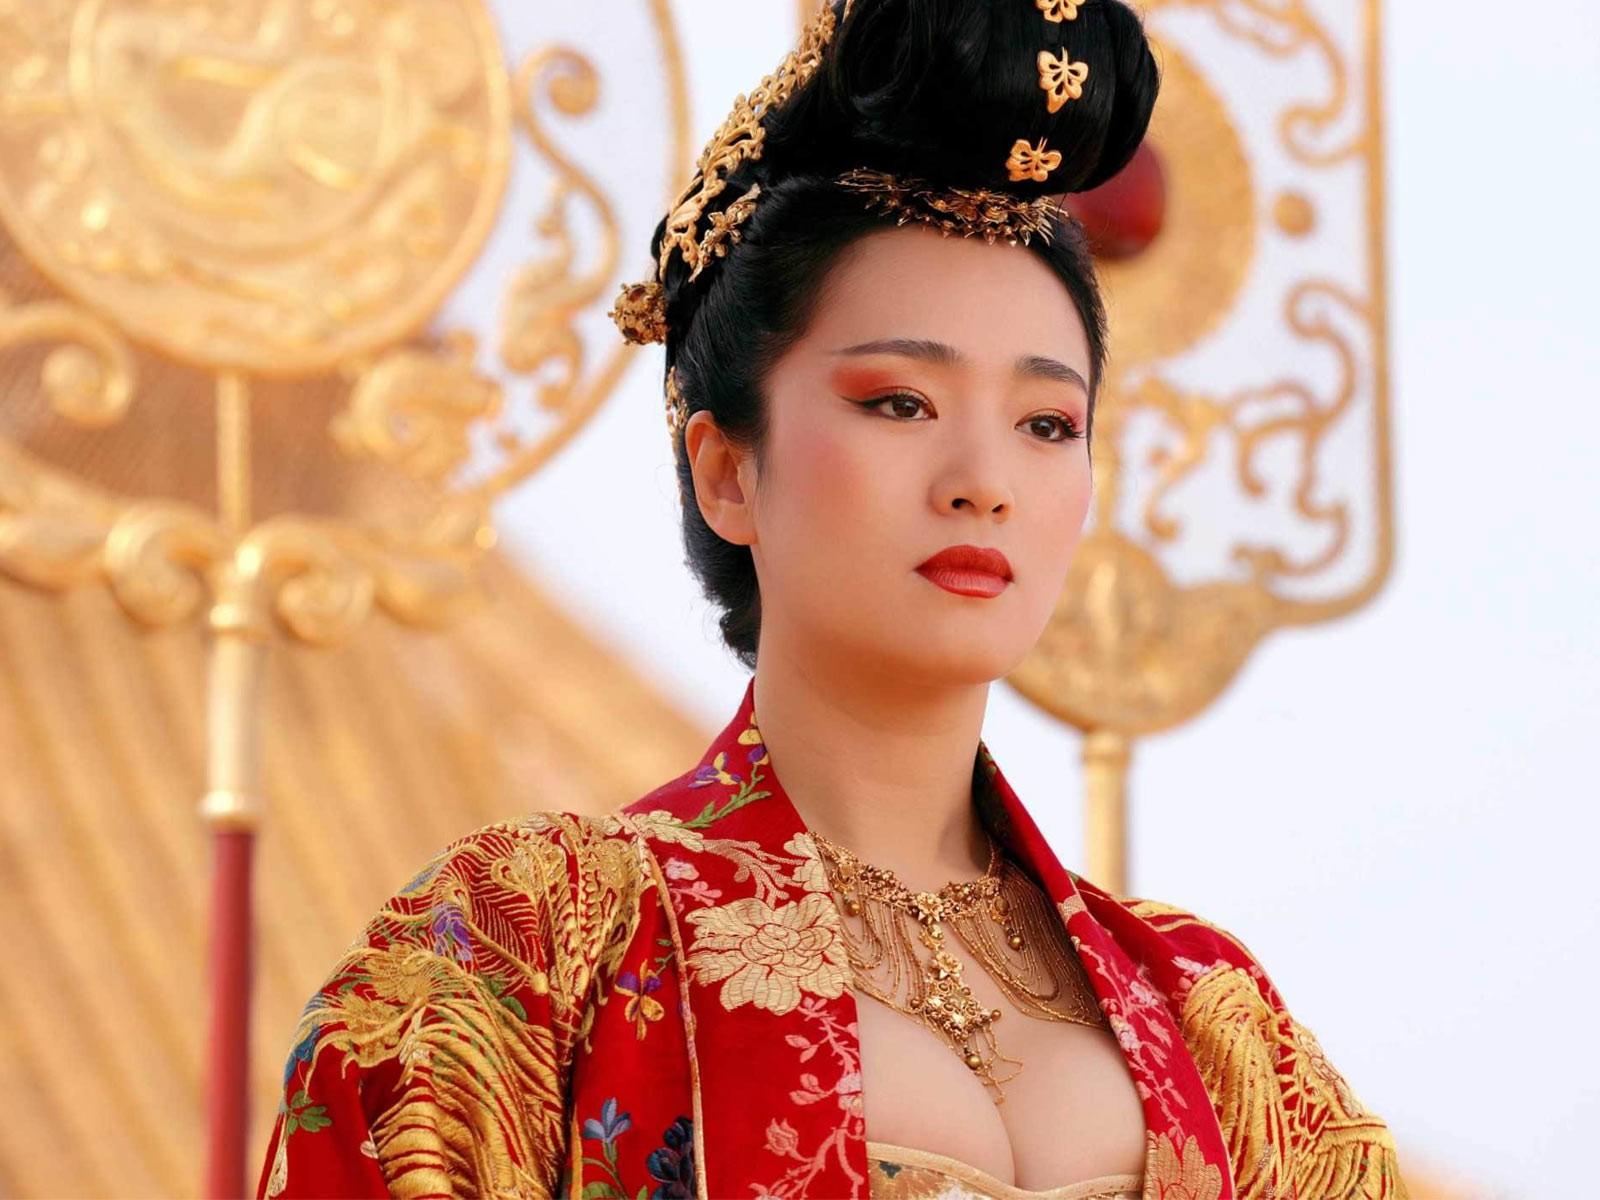 u11307_4996_china_girl